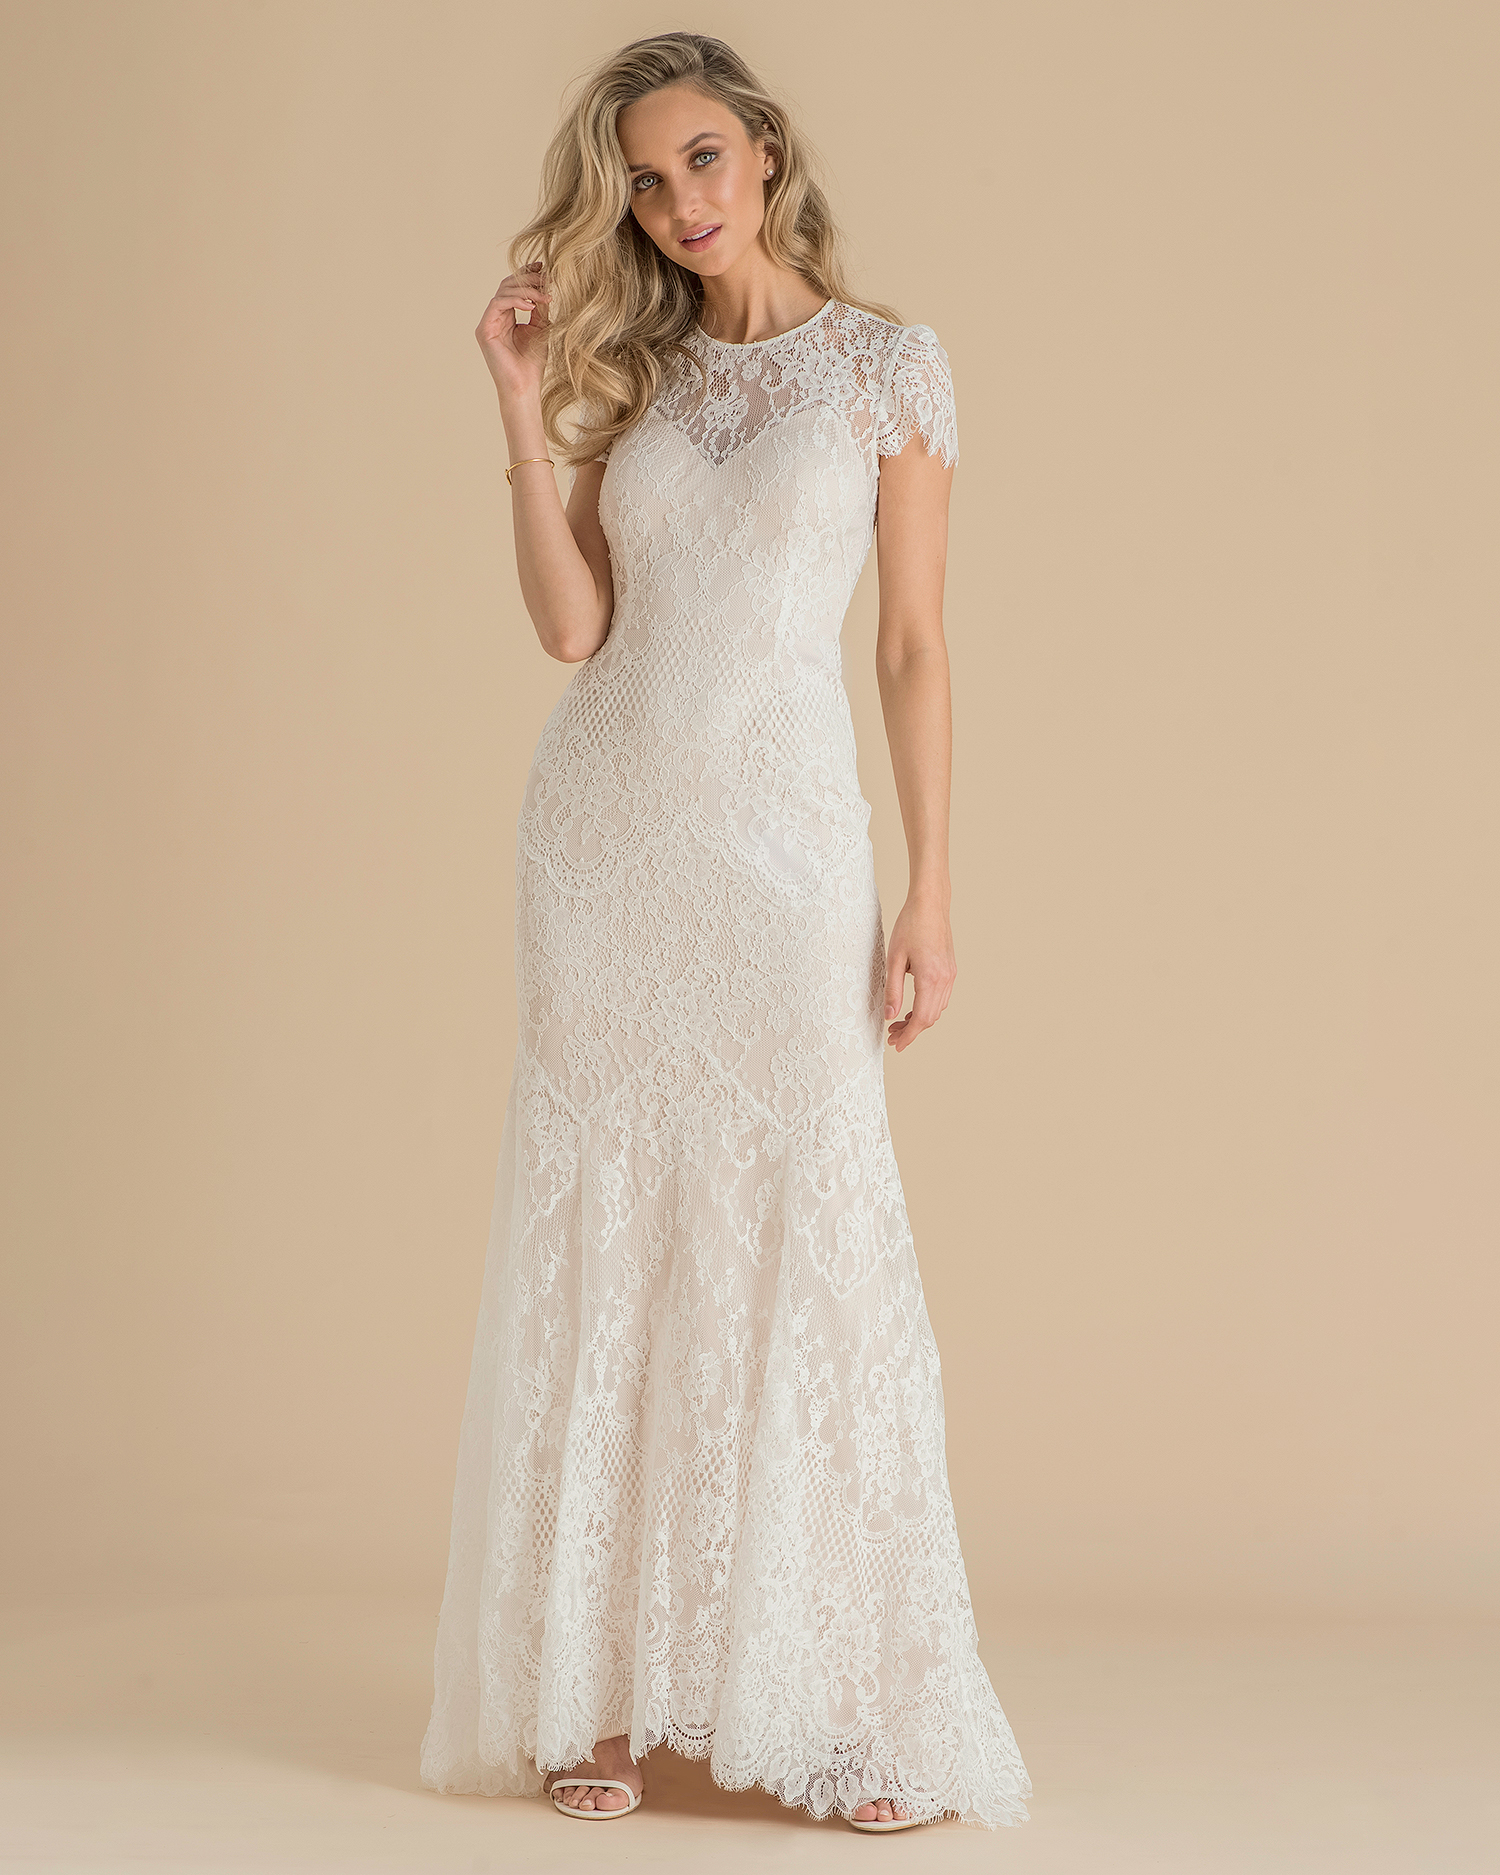 catherine deane wedding dress spring 2019 short-sleeved lace overlay